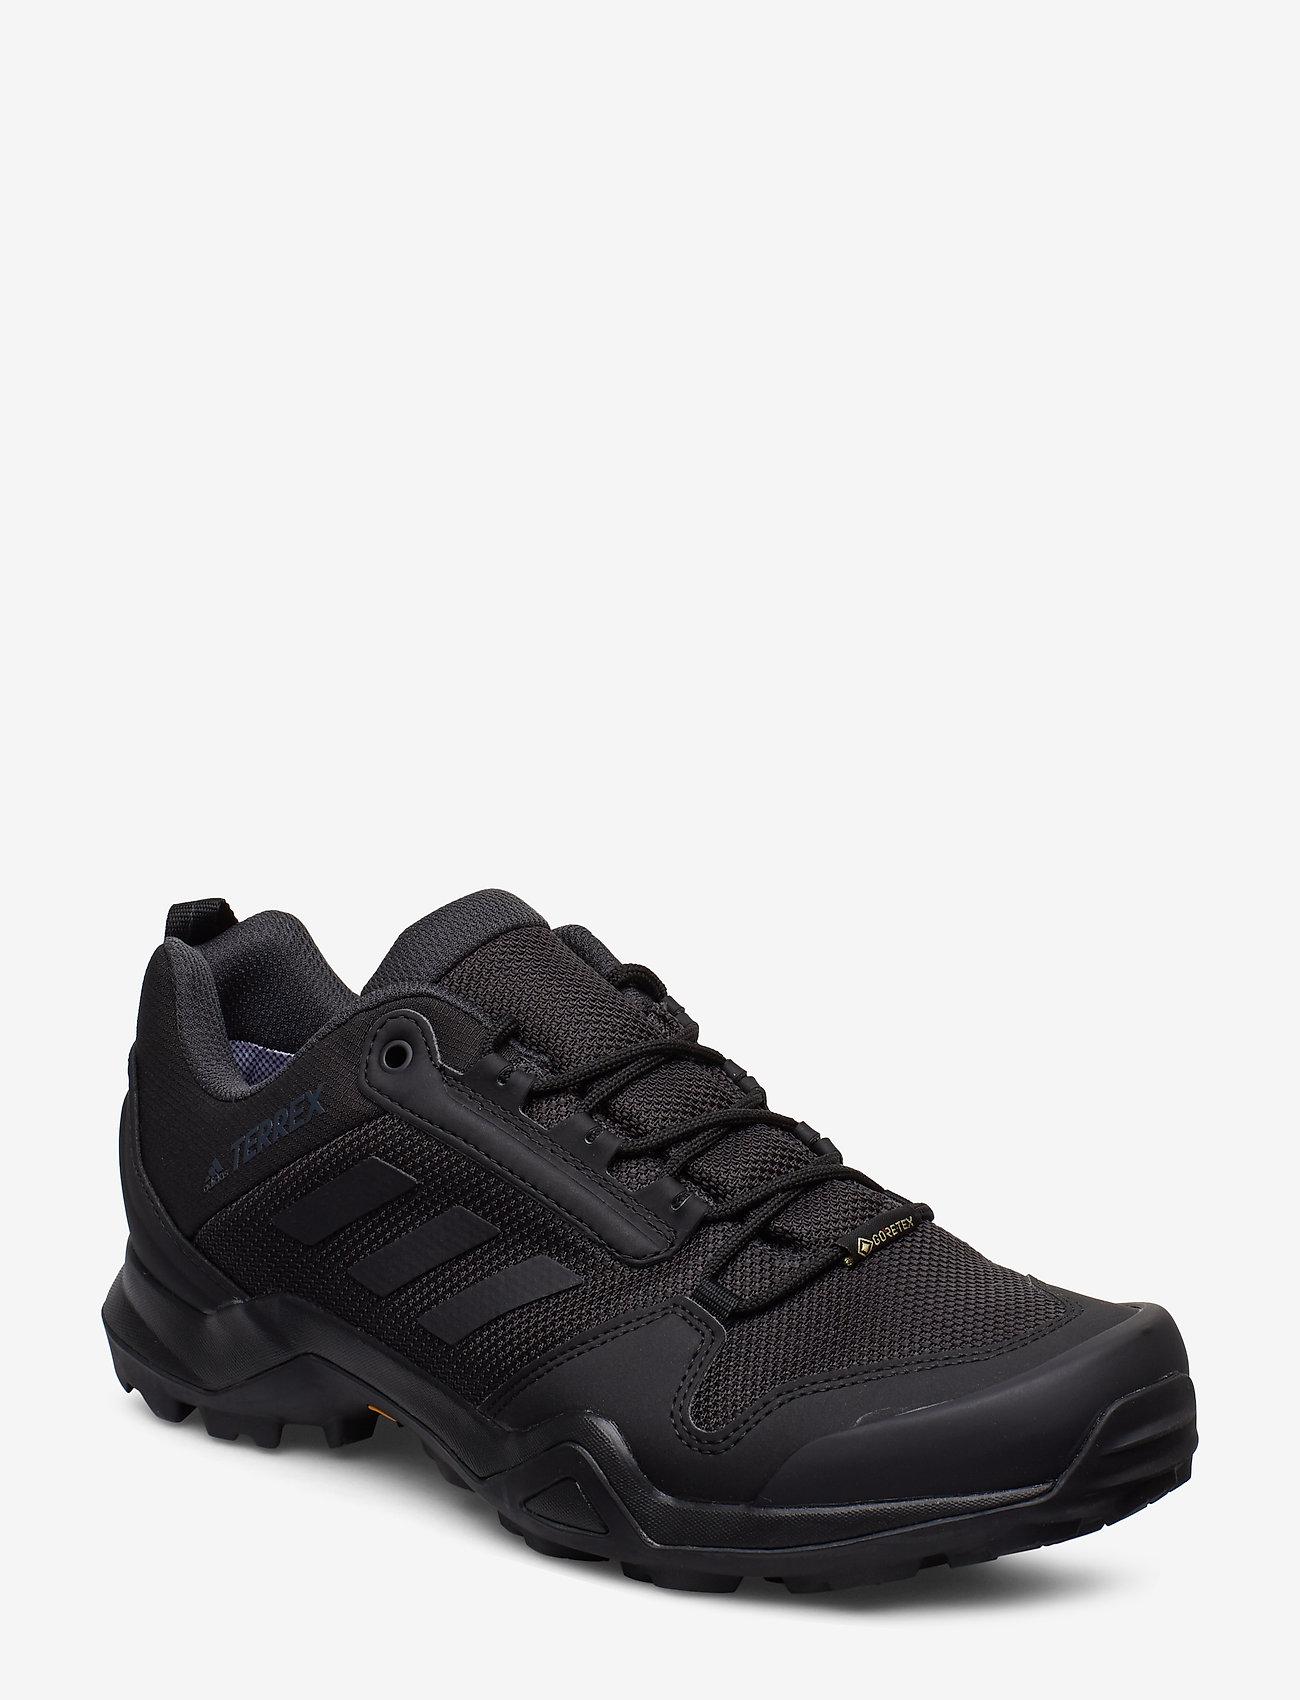 adidas Performance - TERREX AX3 GTX - löbesko - cblack/cblack/carbon - 0